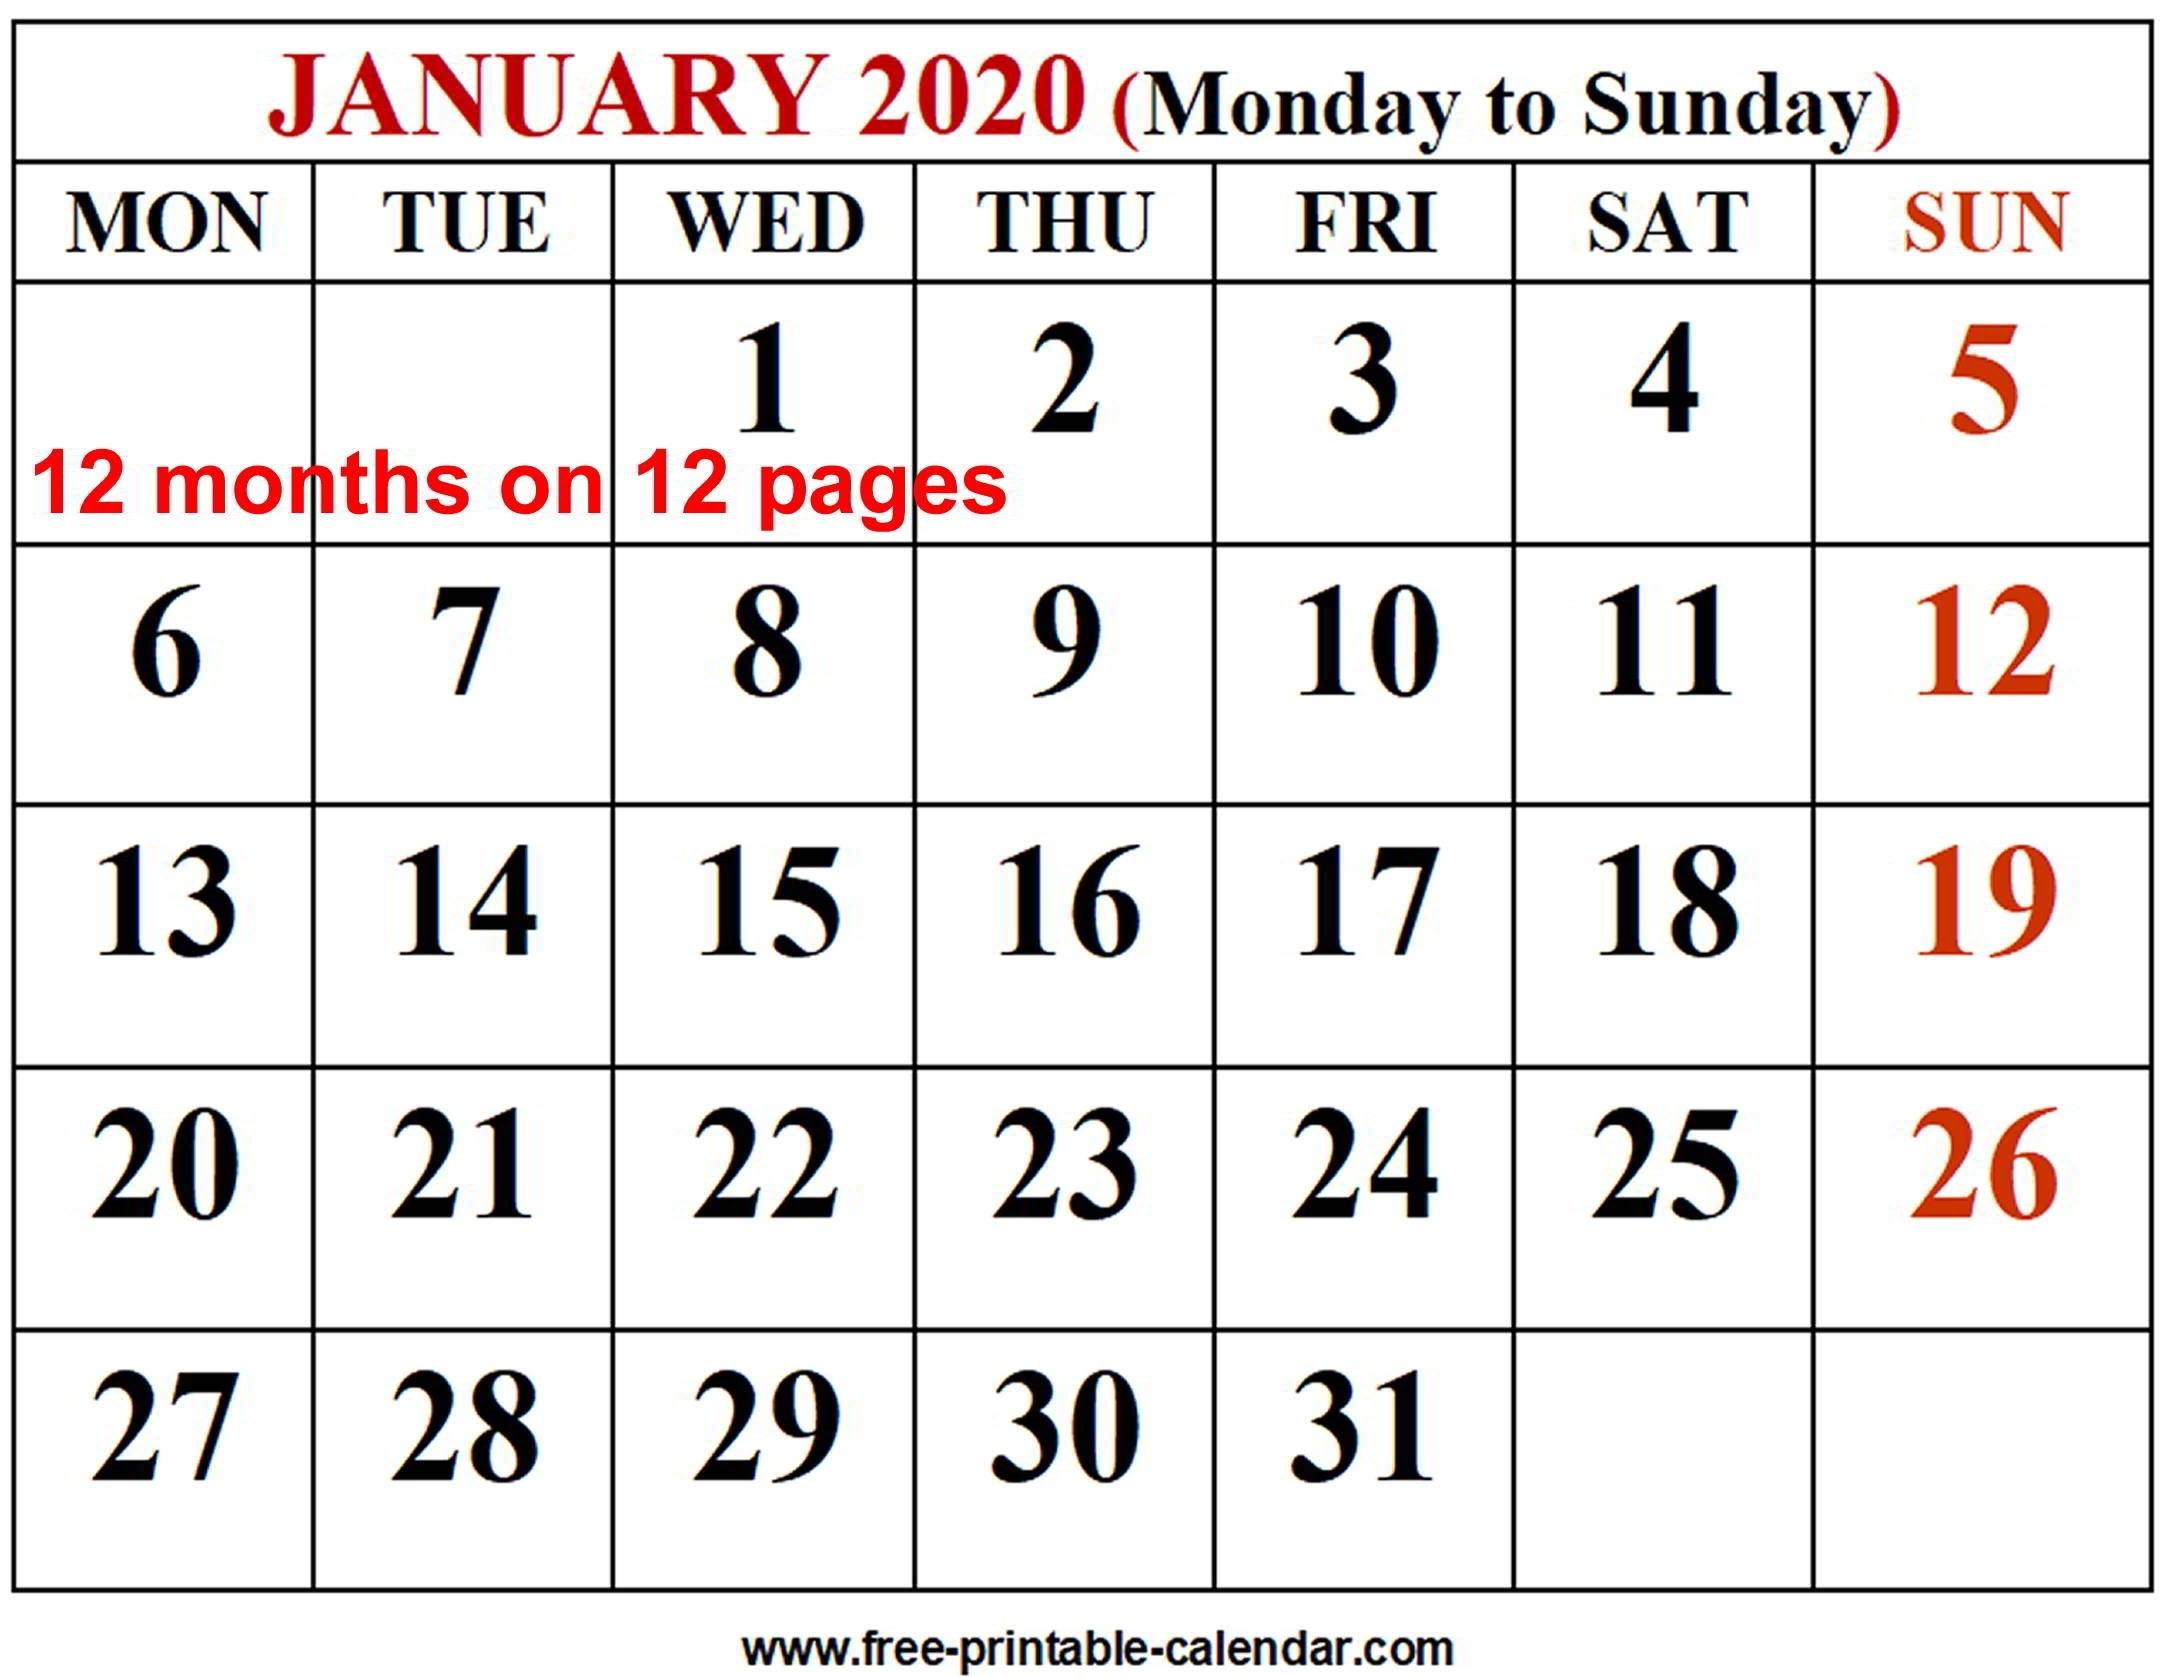 2020 Calendar Template – Free-Printable-Calendar-3 Month